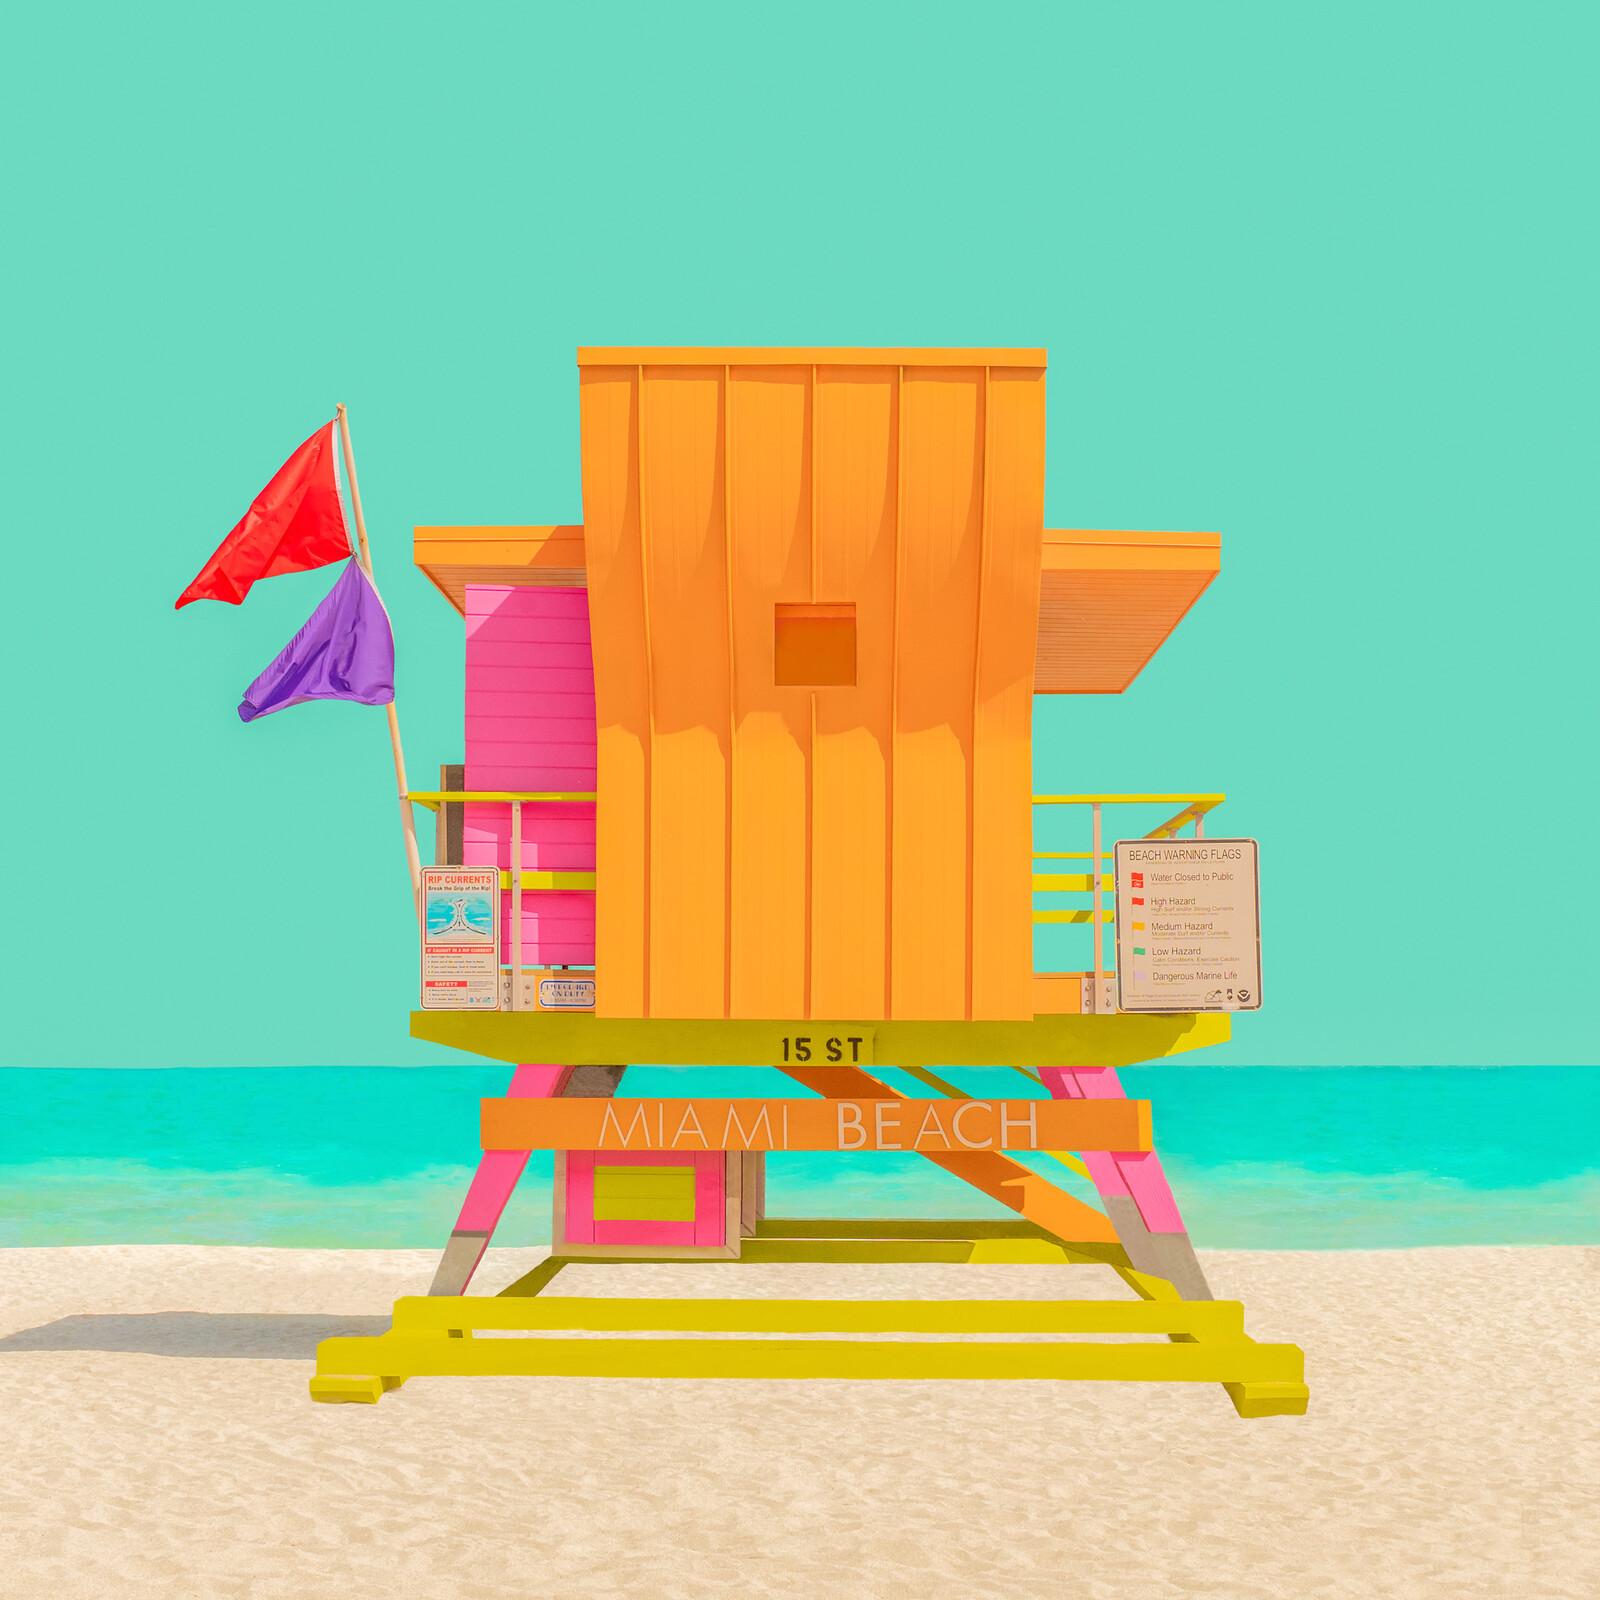 The Modern Paradise - Miami Beach 4 - Mijoo Kim & Minjin Kang